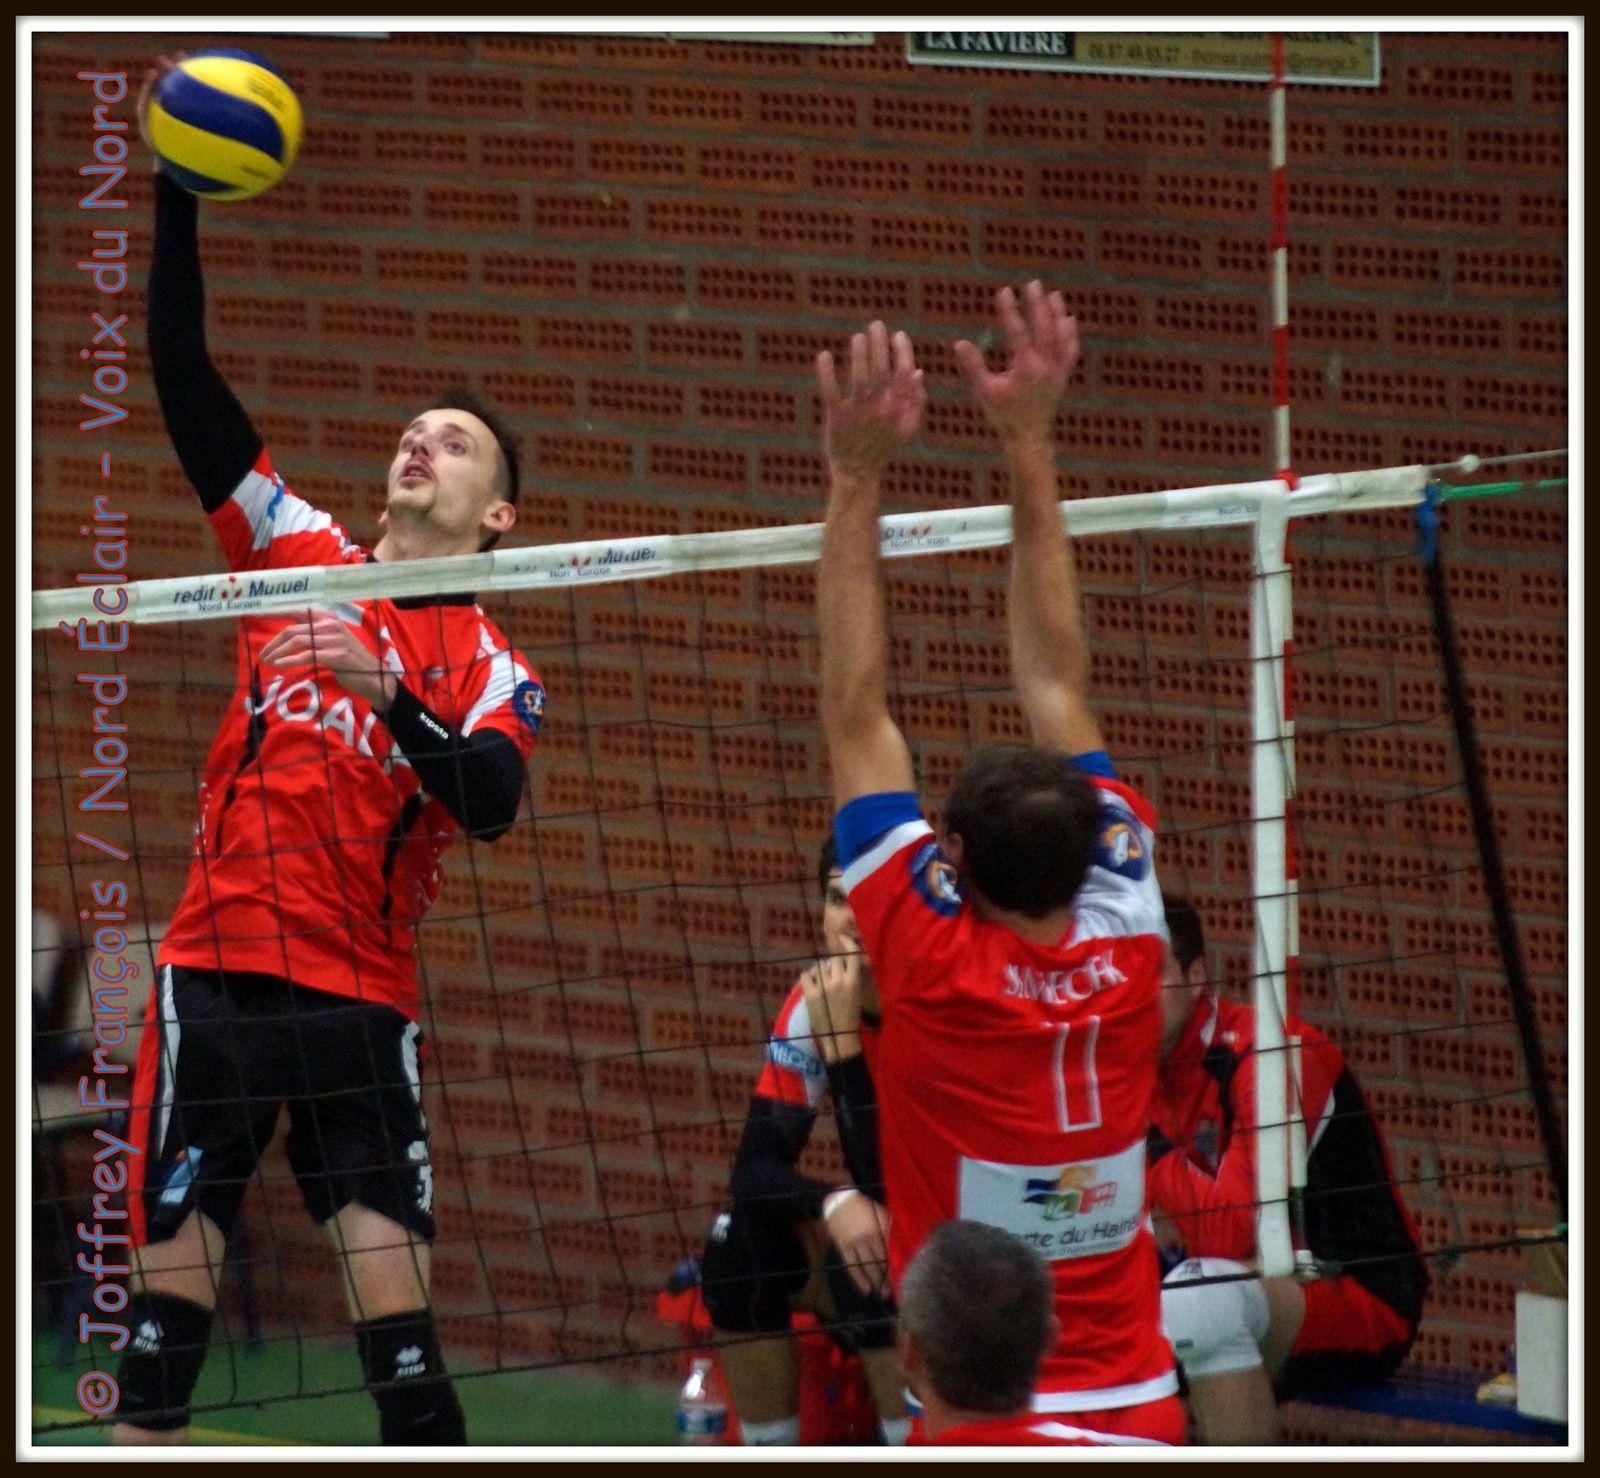 5-6 / 11 / 16 Futsal - Volley - Foot - Rugby